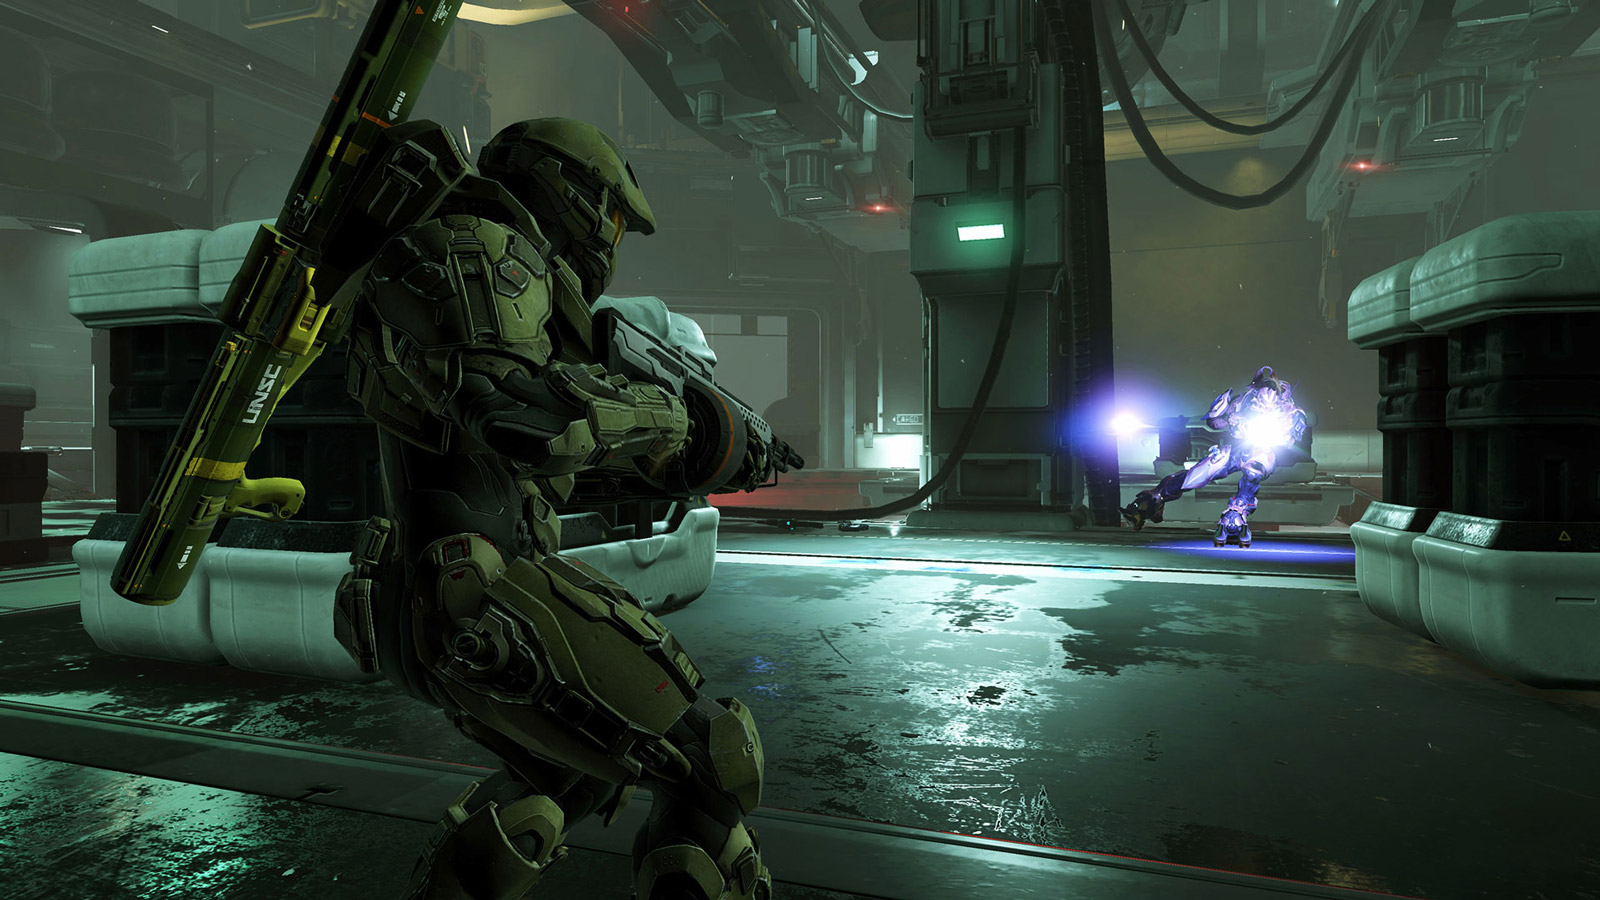 Halo 5: Guardians Wallpaper in 1600x900